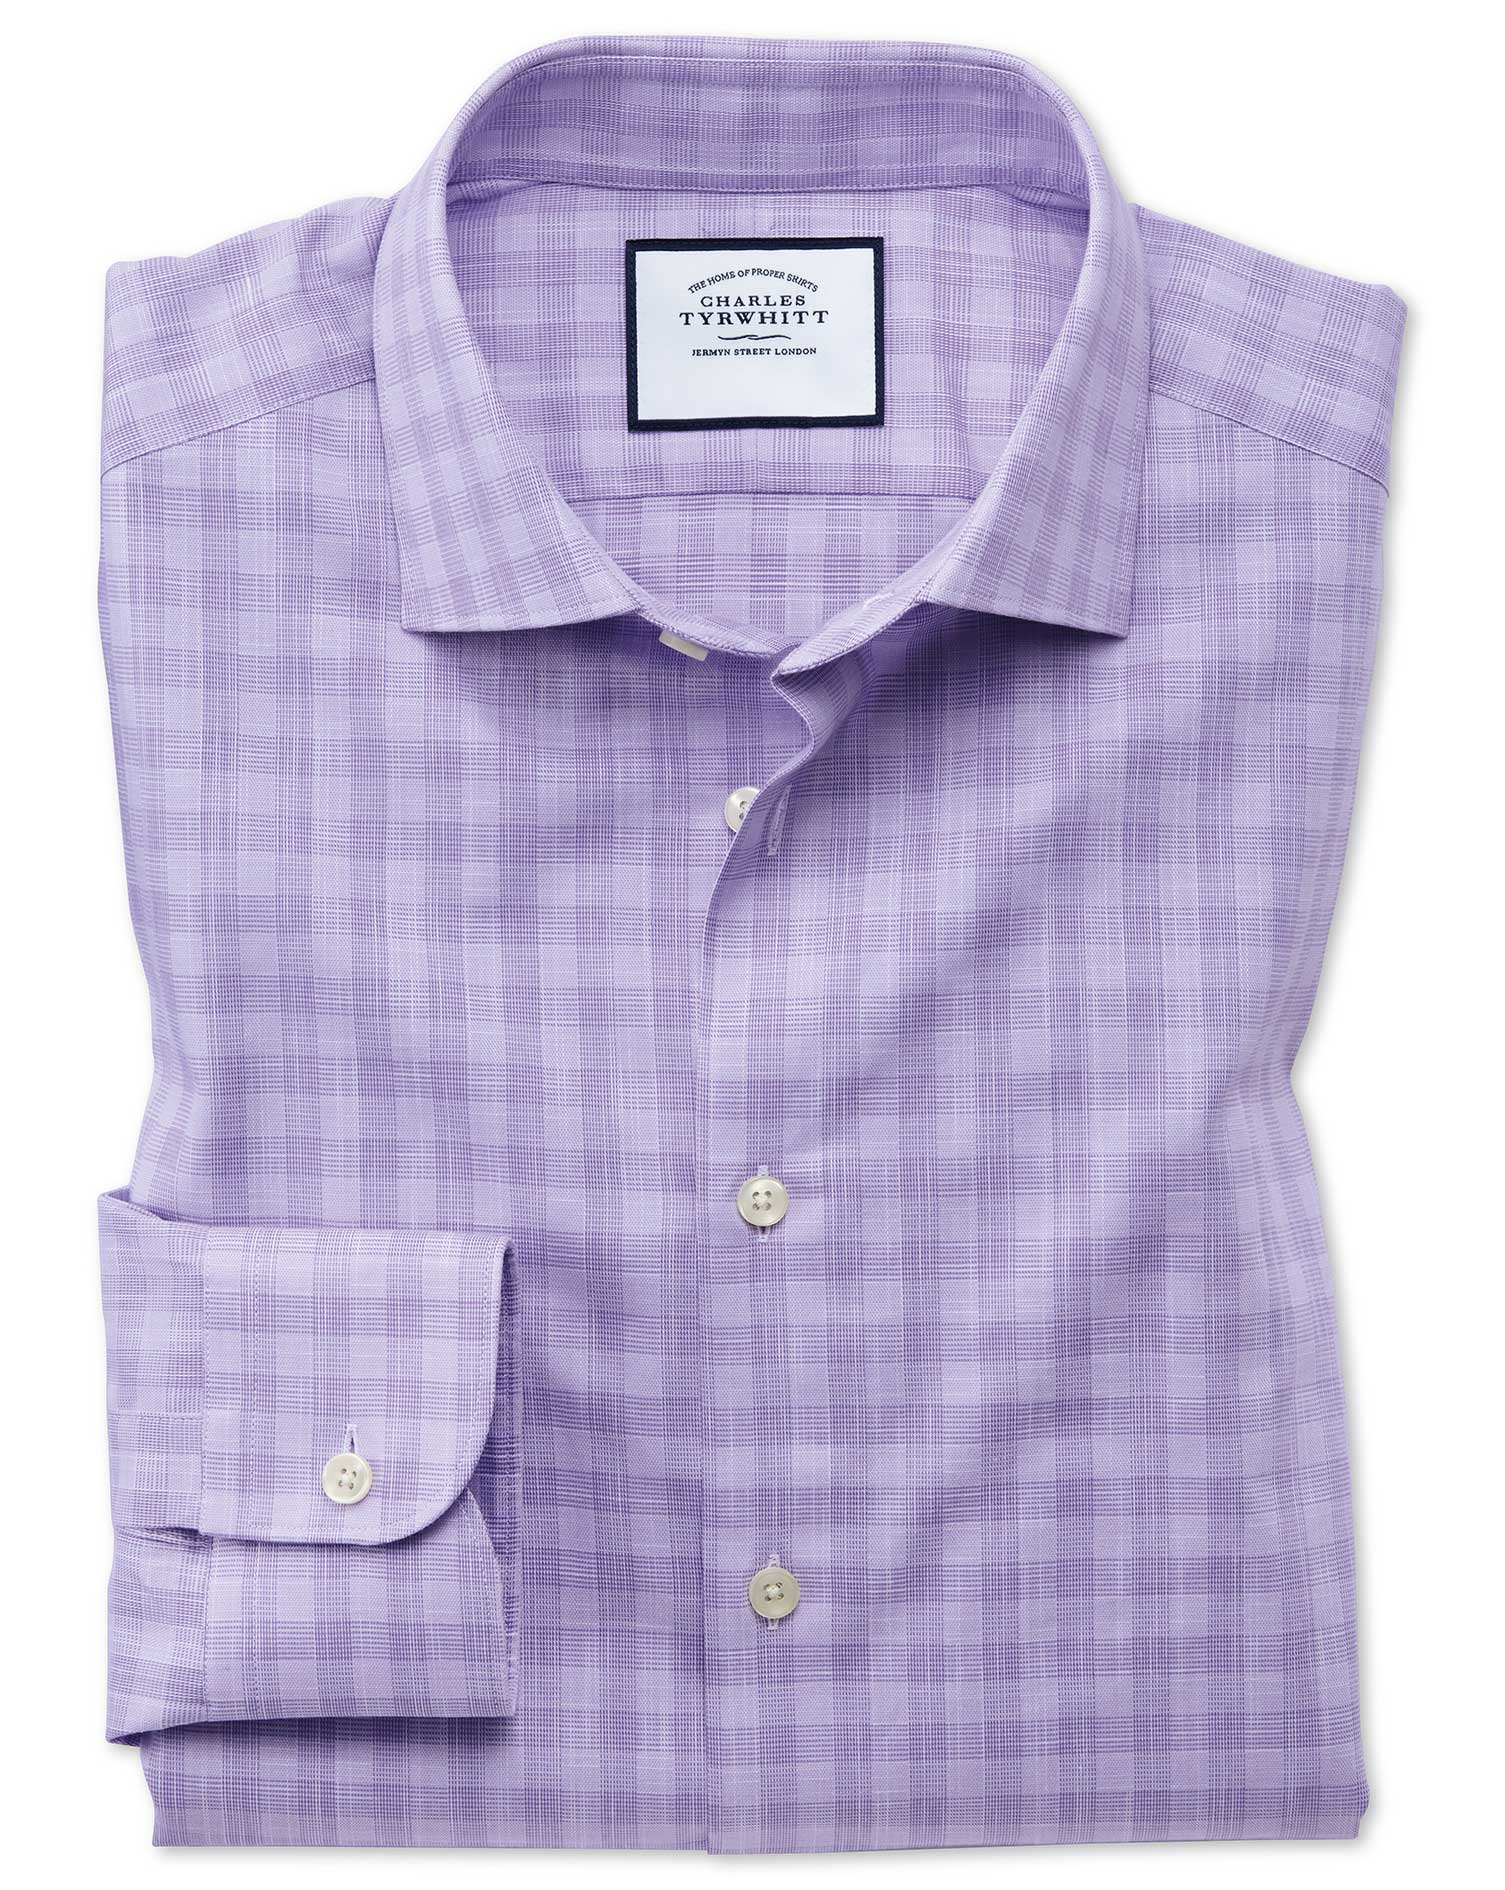 Classic Fit Business Casual Egyptian Cotton Slub Lilac Check Formal Shirt Single Cuff Size 16.5/38 b